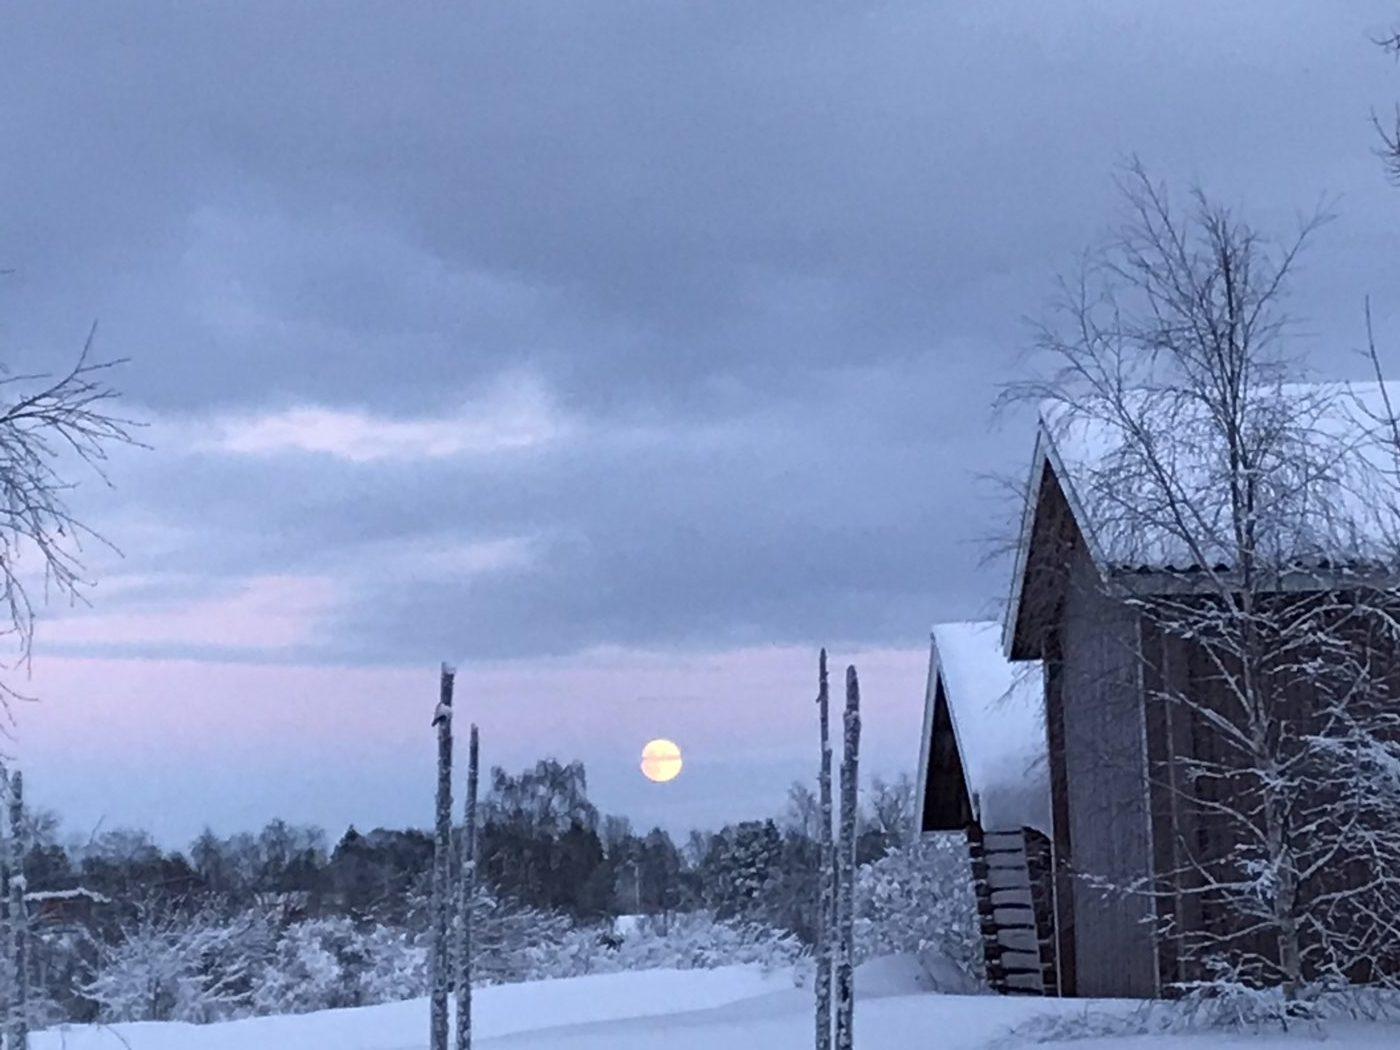 31 december - Cricco nästan fullmåne